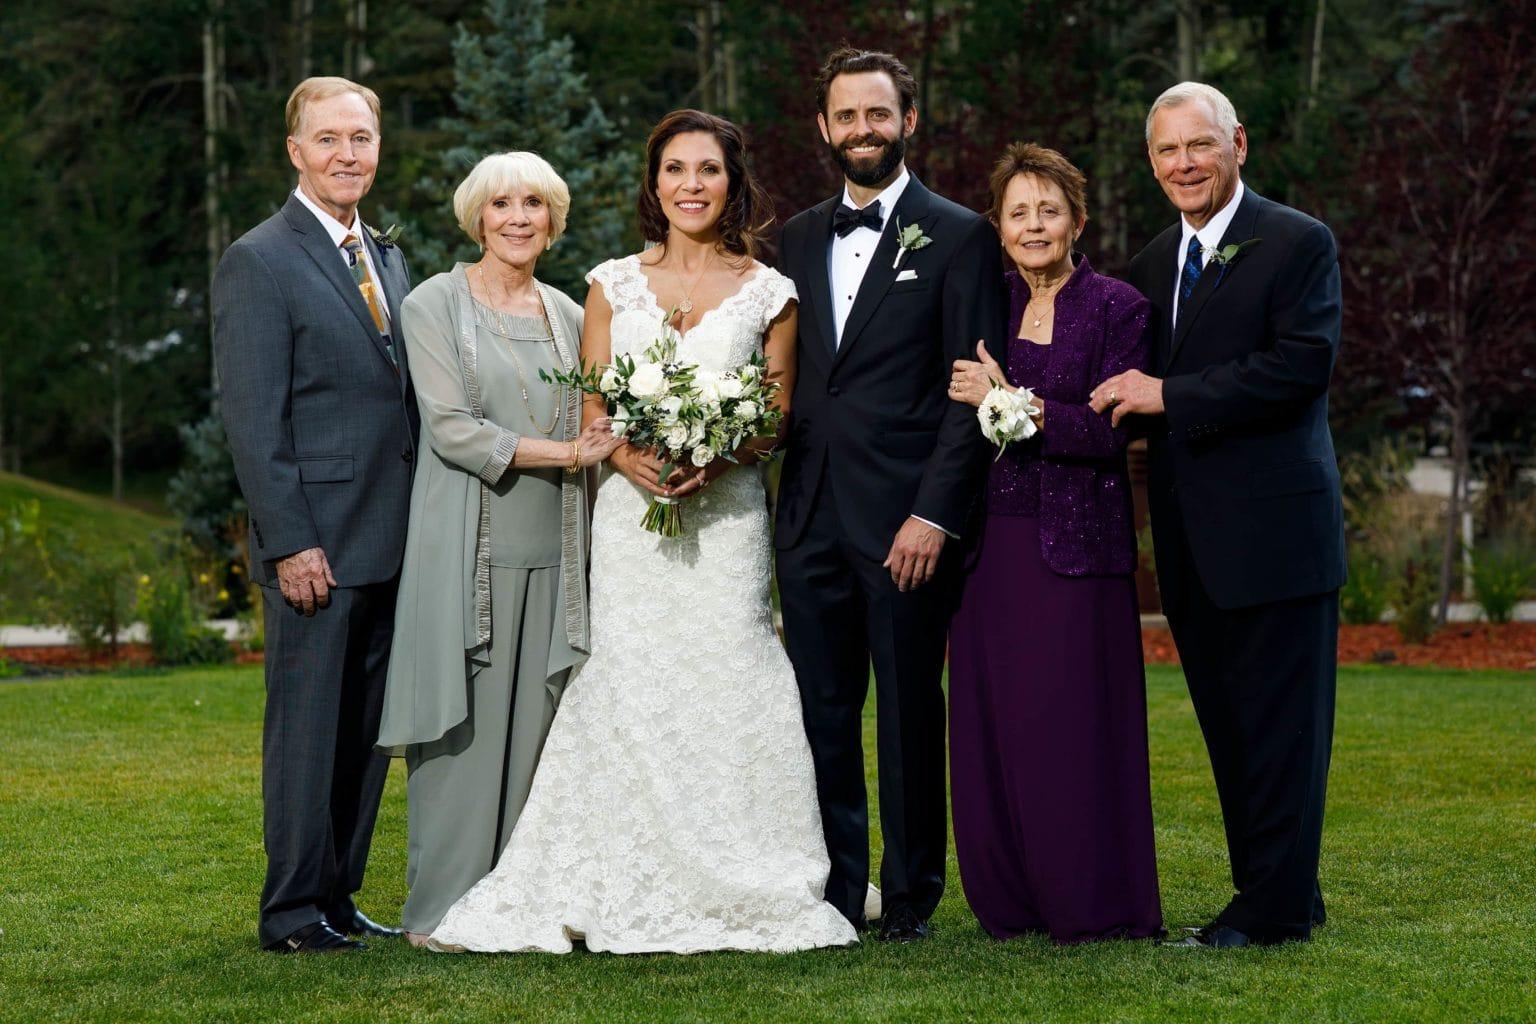 Formal family portrait at a Vail Golf Club Wedding